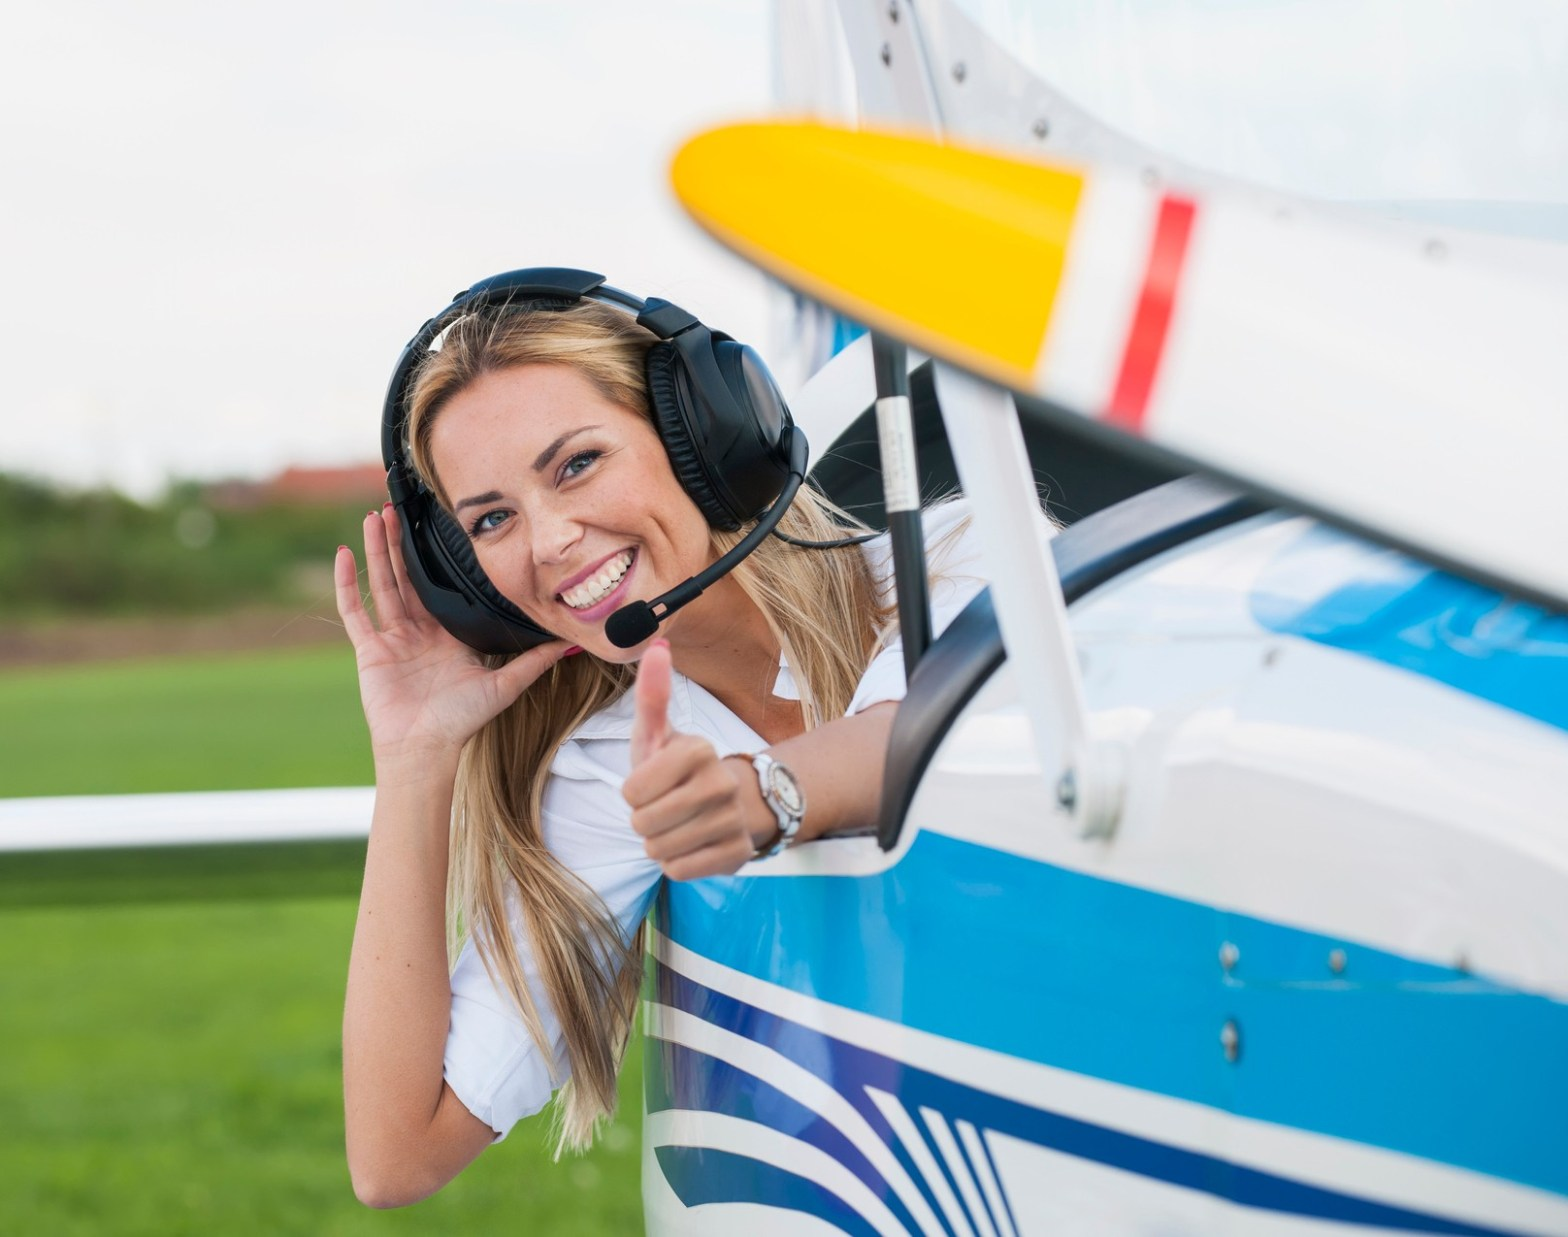 Woman pilot looking at camera, preparing for flying, Sky Review